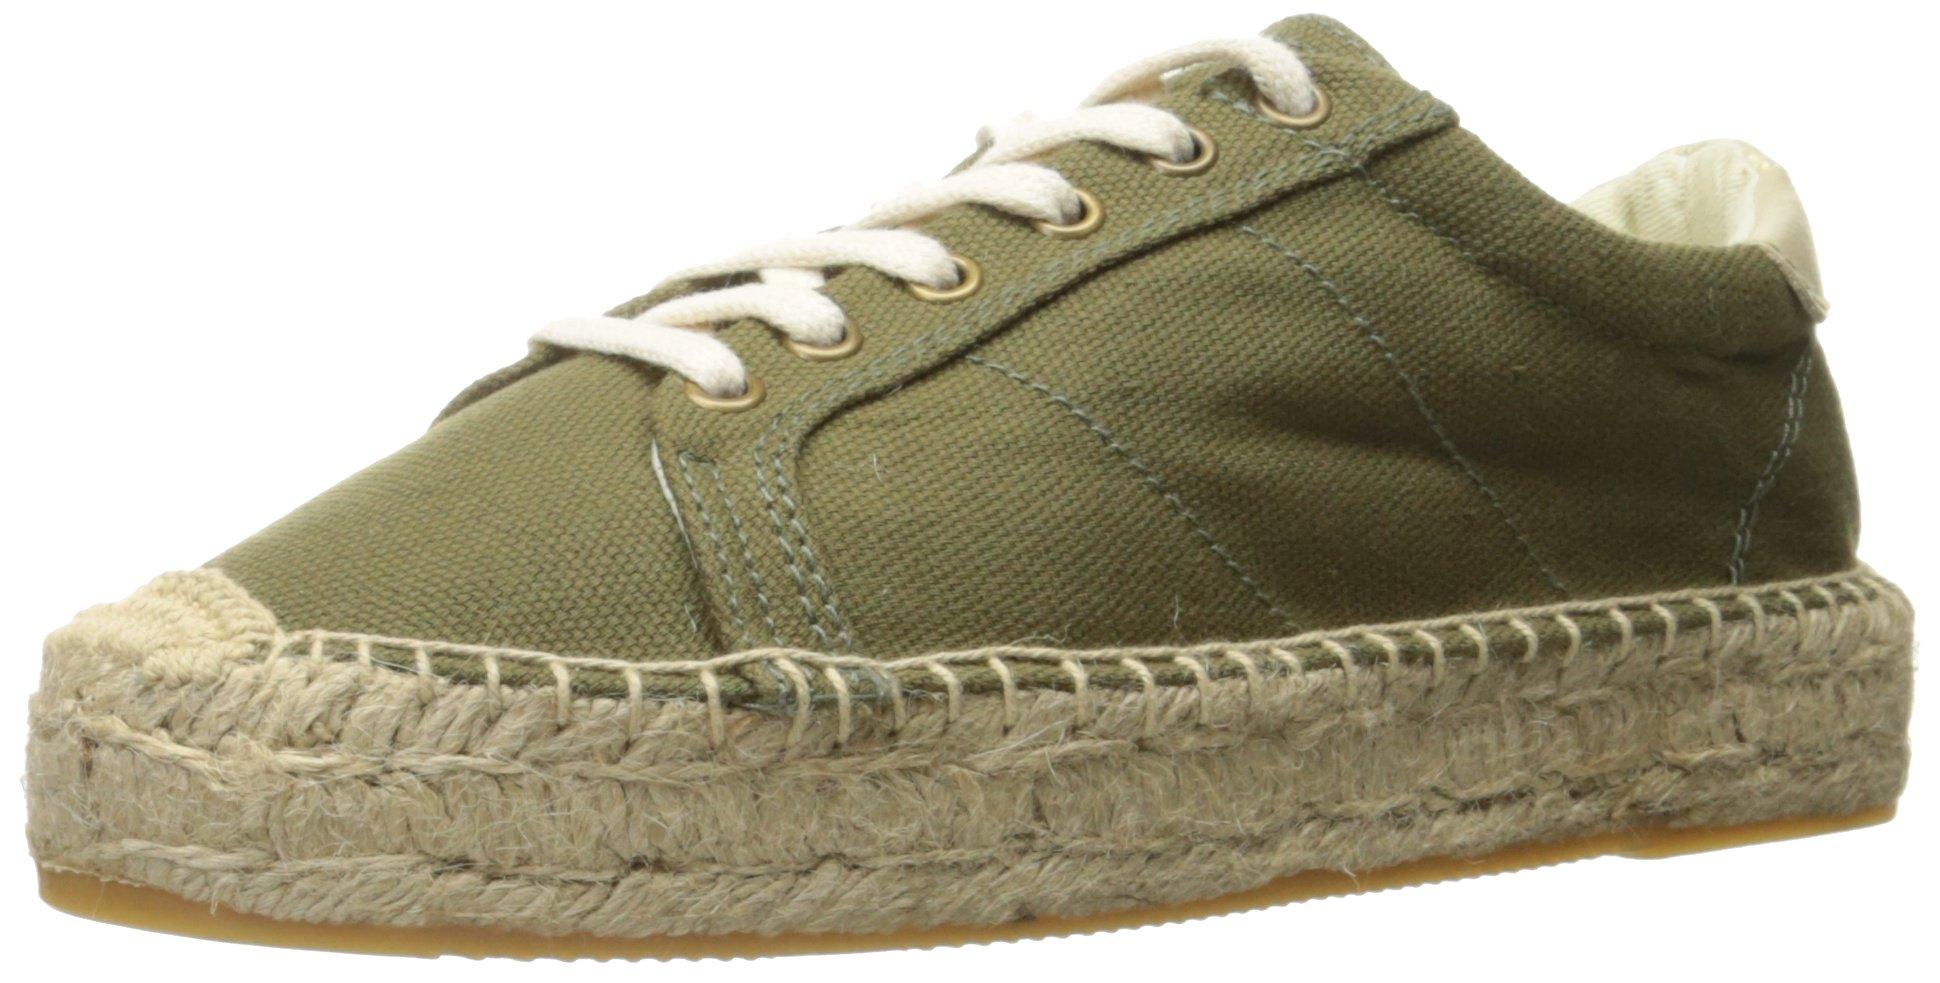 Soludos Women's Canvas Platform Tennis Sneaker Sandal, Camo Green, 9.5 B US